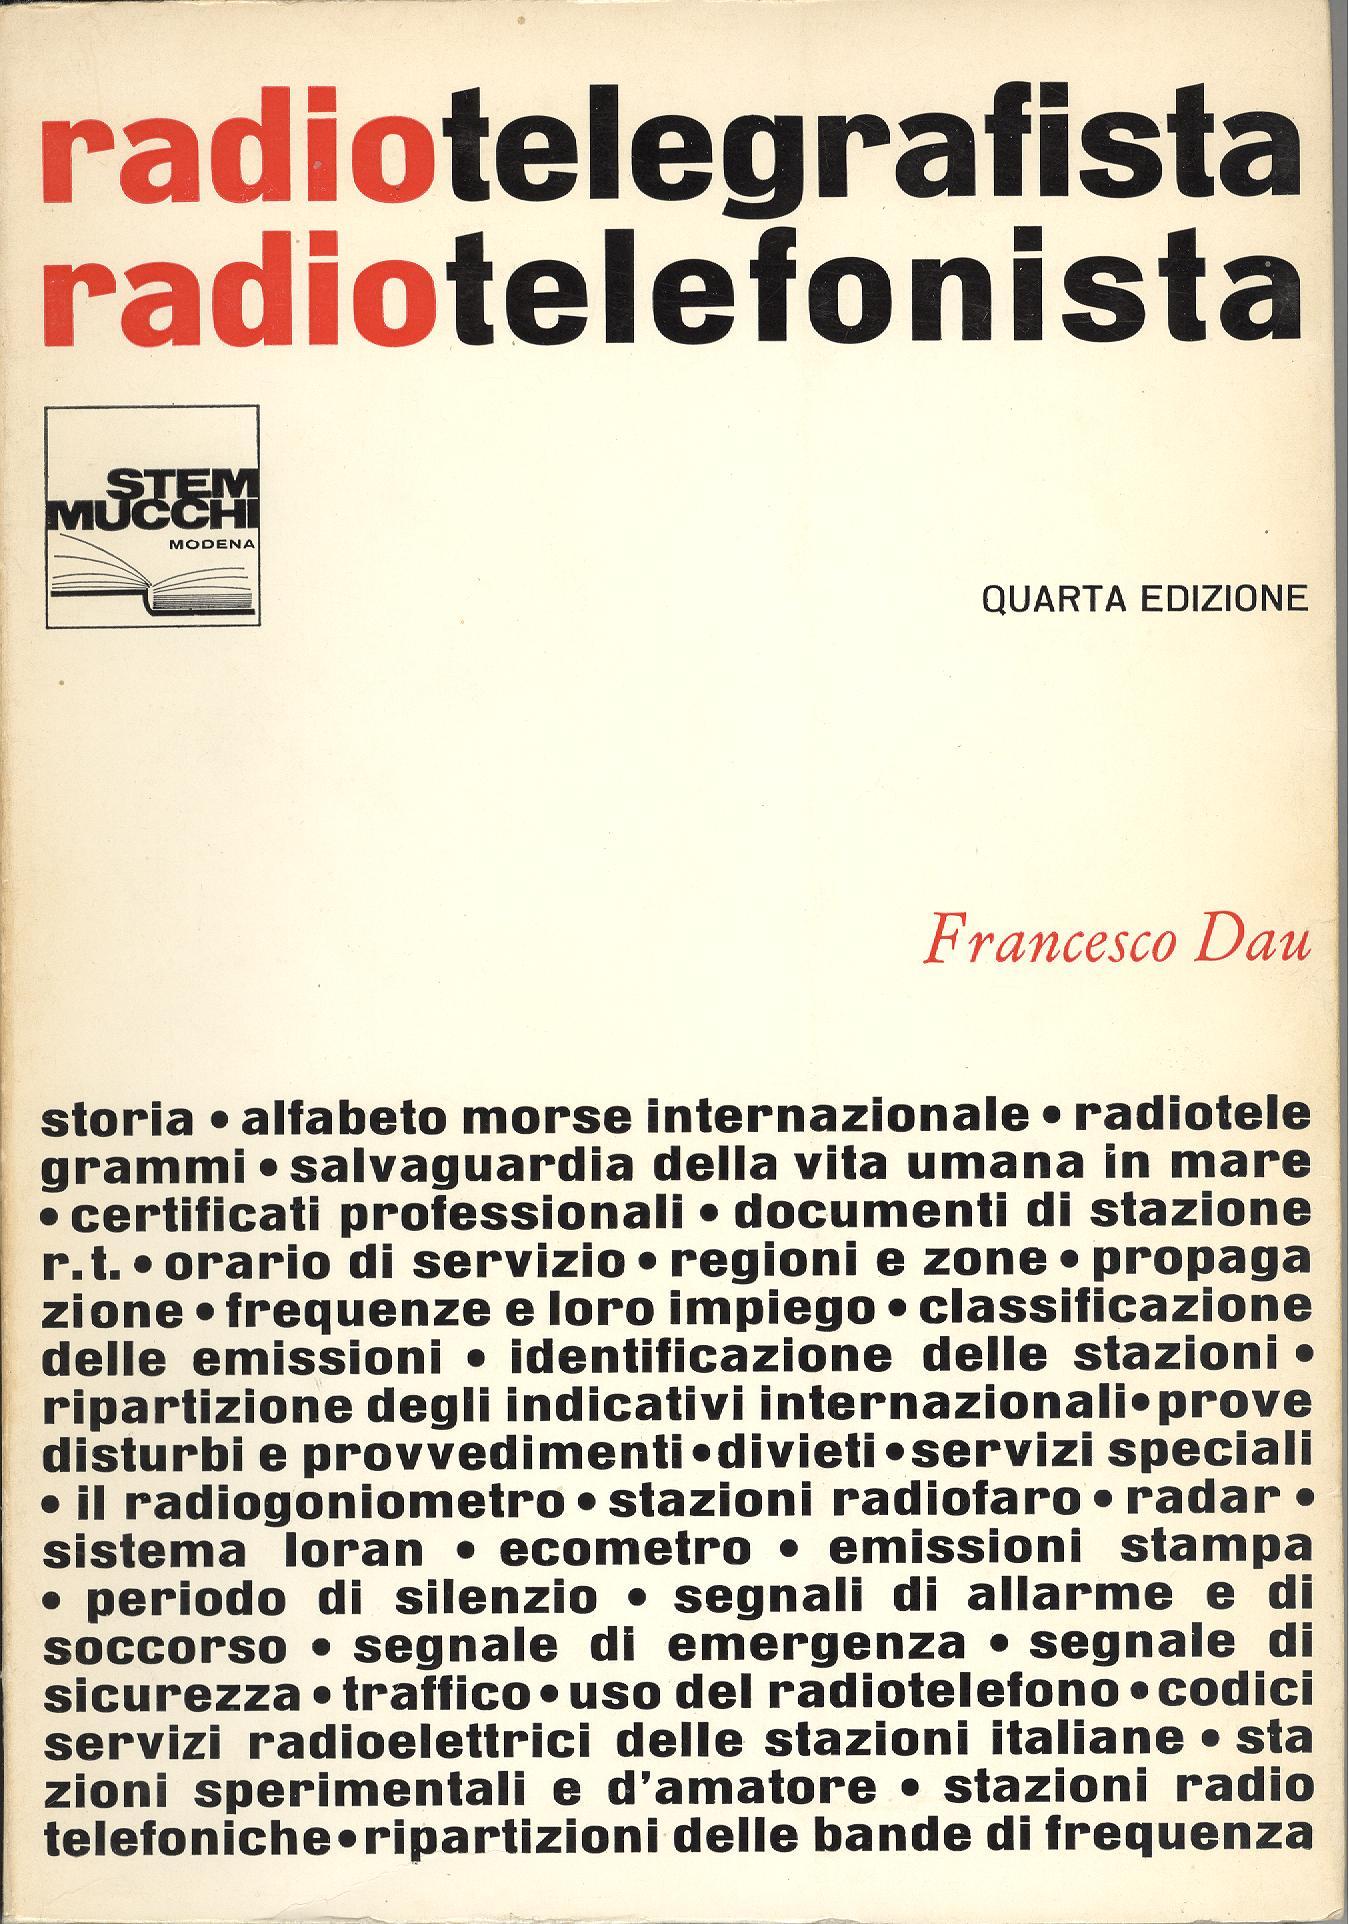 Il Radiotelegrafista e radiotelefonista